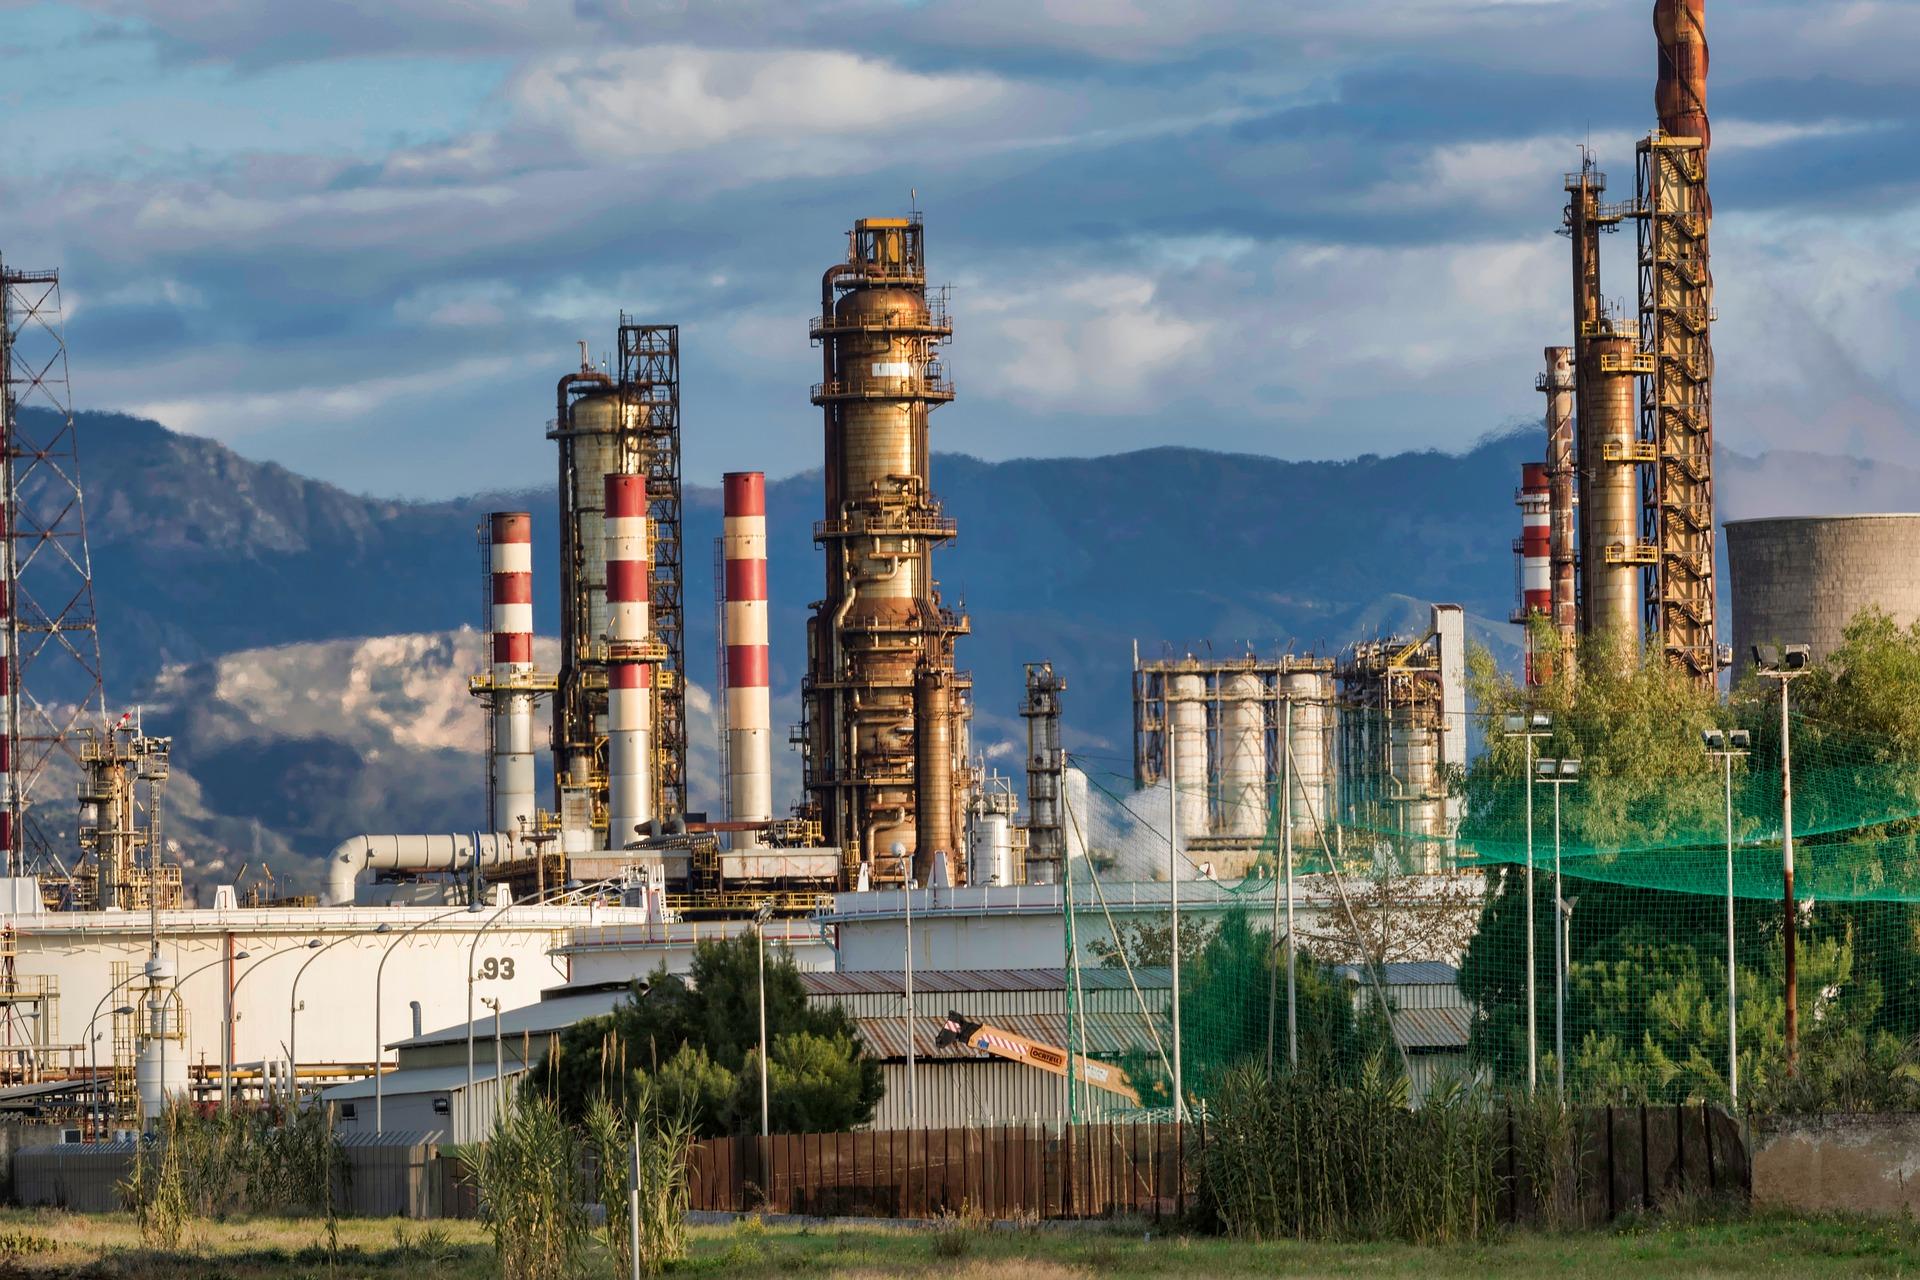 gibanje cen nafte